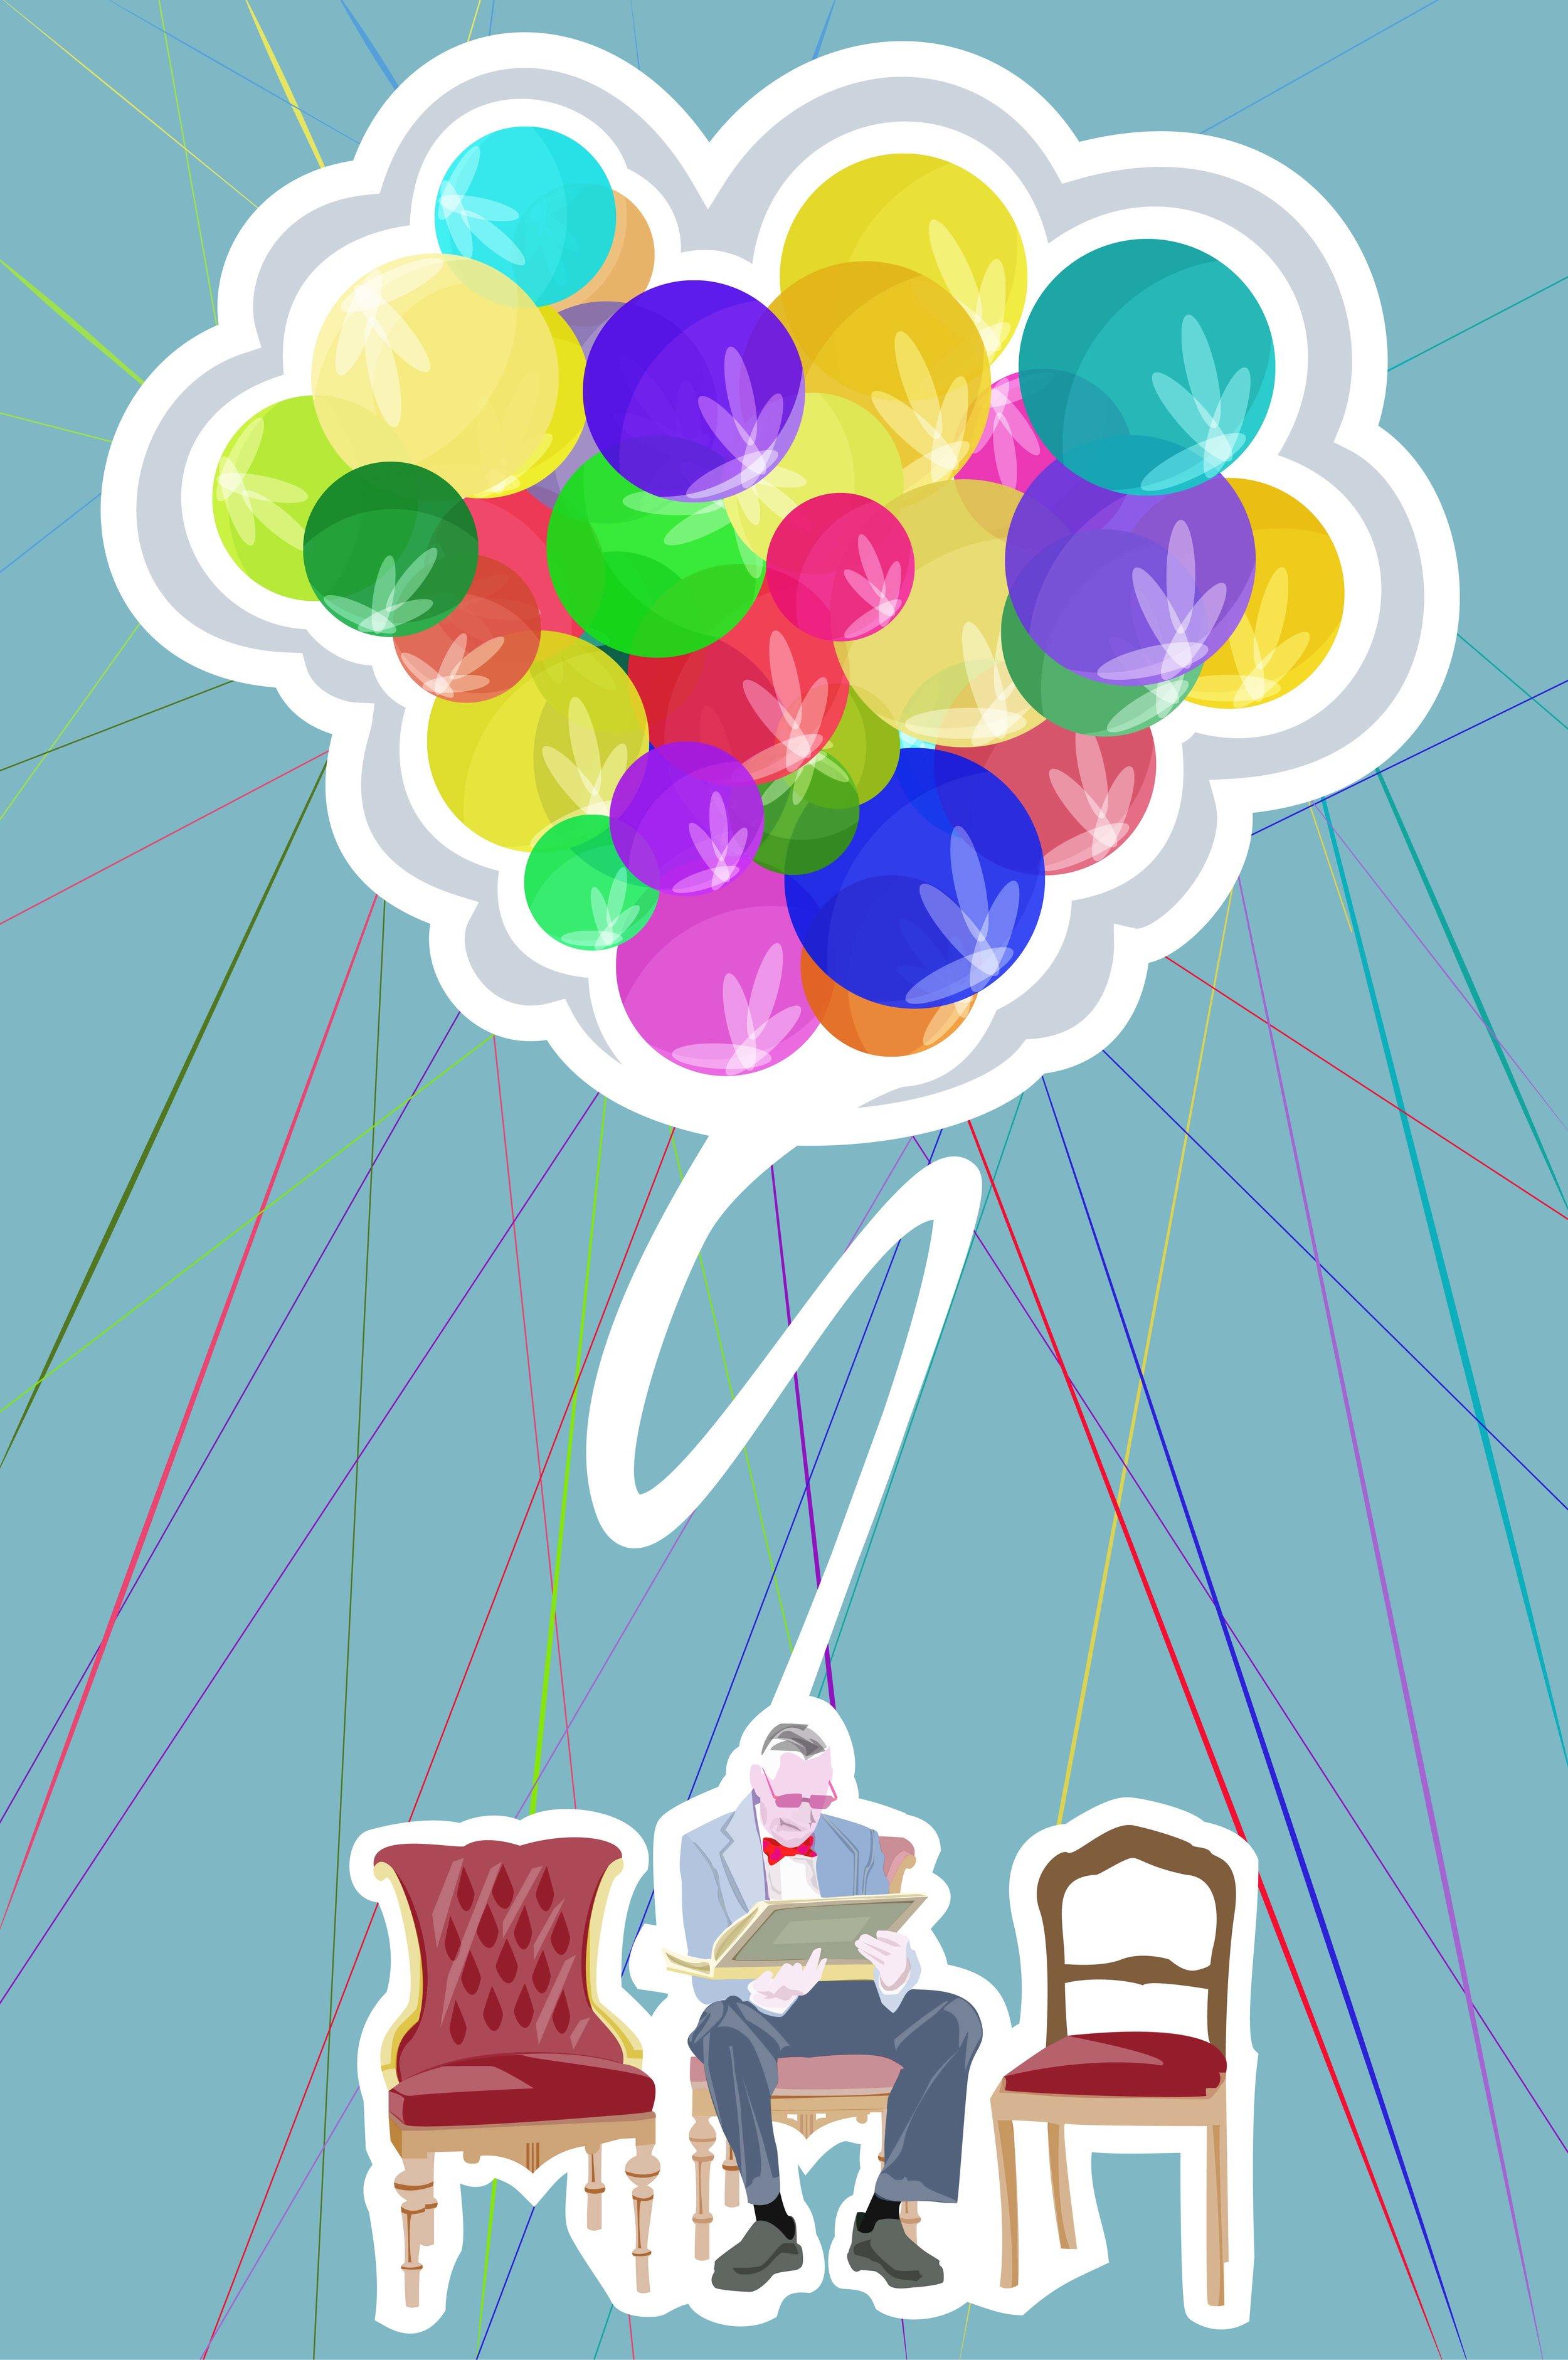 balloonn.jpg